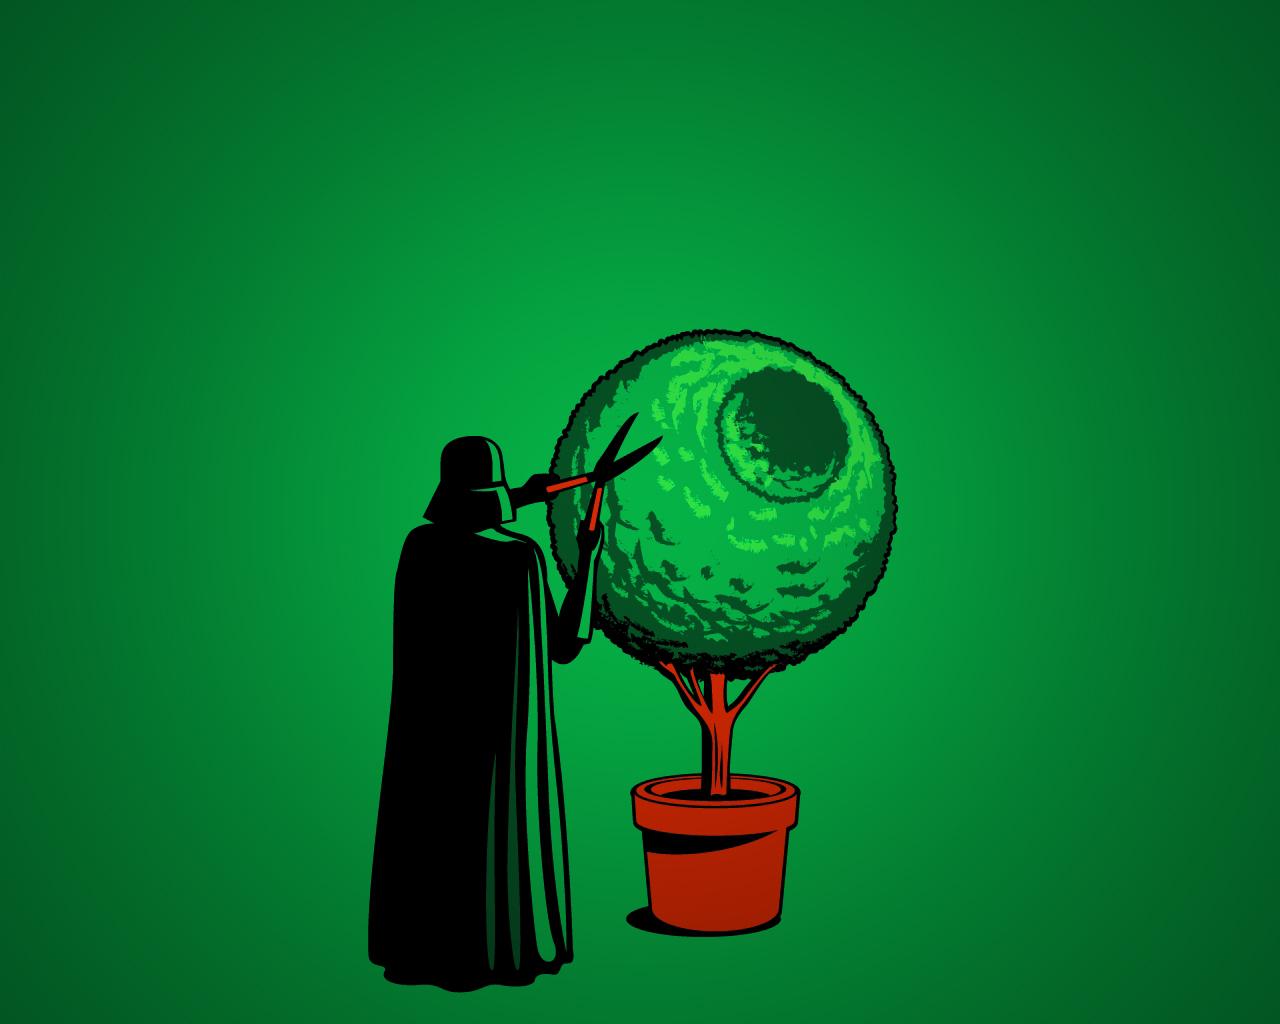 Free Download Star Wars Christmas Star Wars 2911910 1280 1024